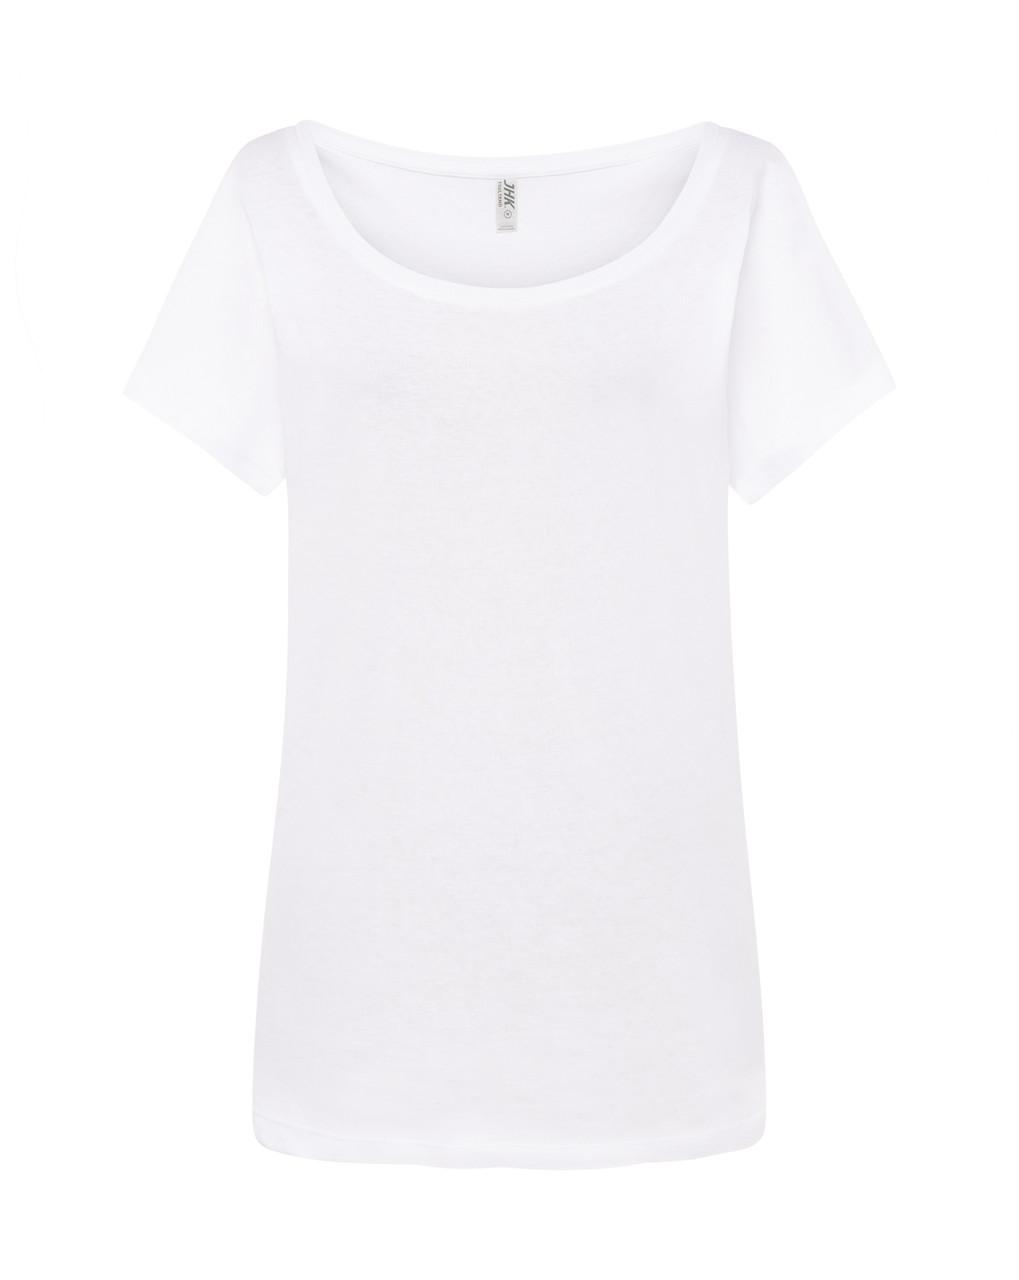 Женская футболка JHK TRINIDAD цвет белый (WH)